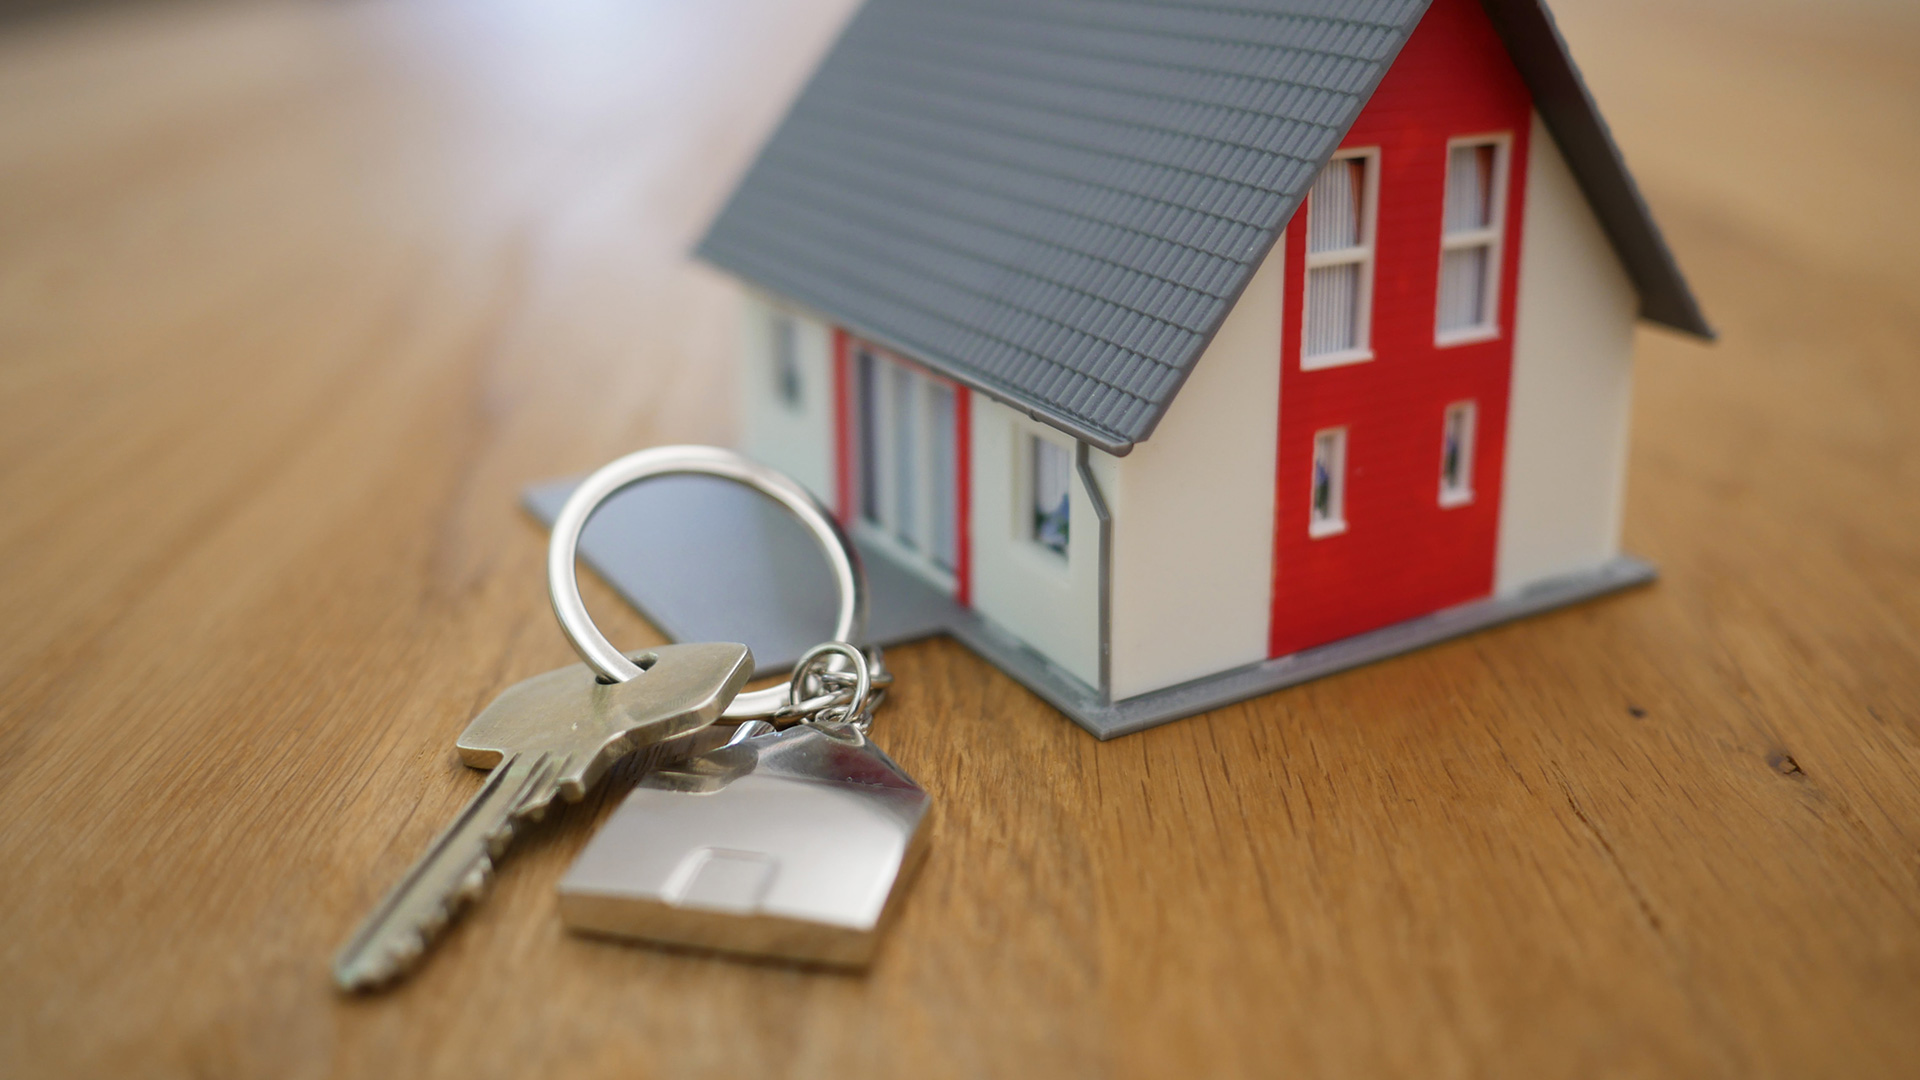 De aflossingsvrije hypotheek (box 3) biedt enorme kansen